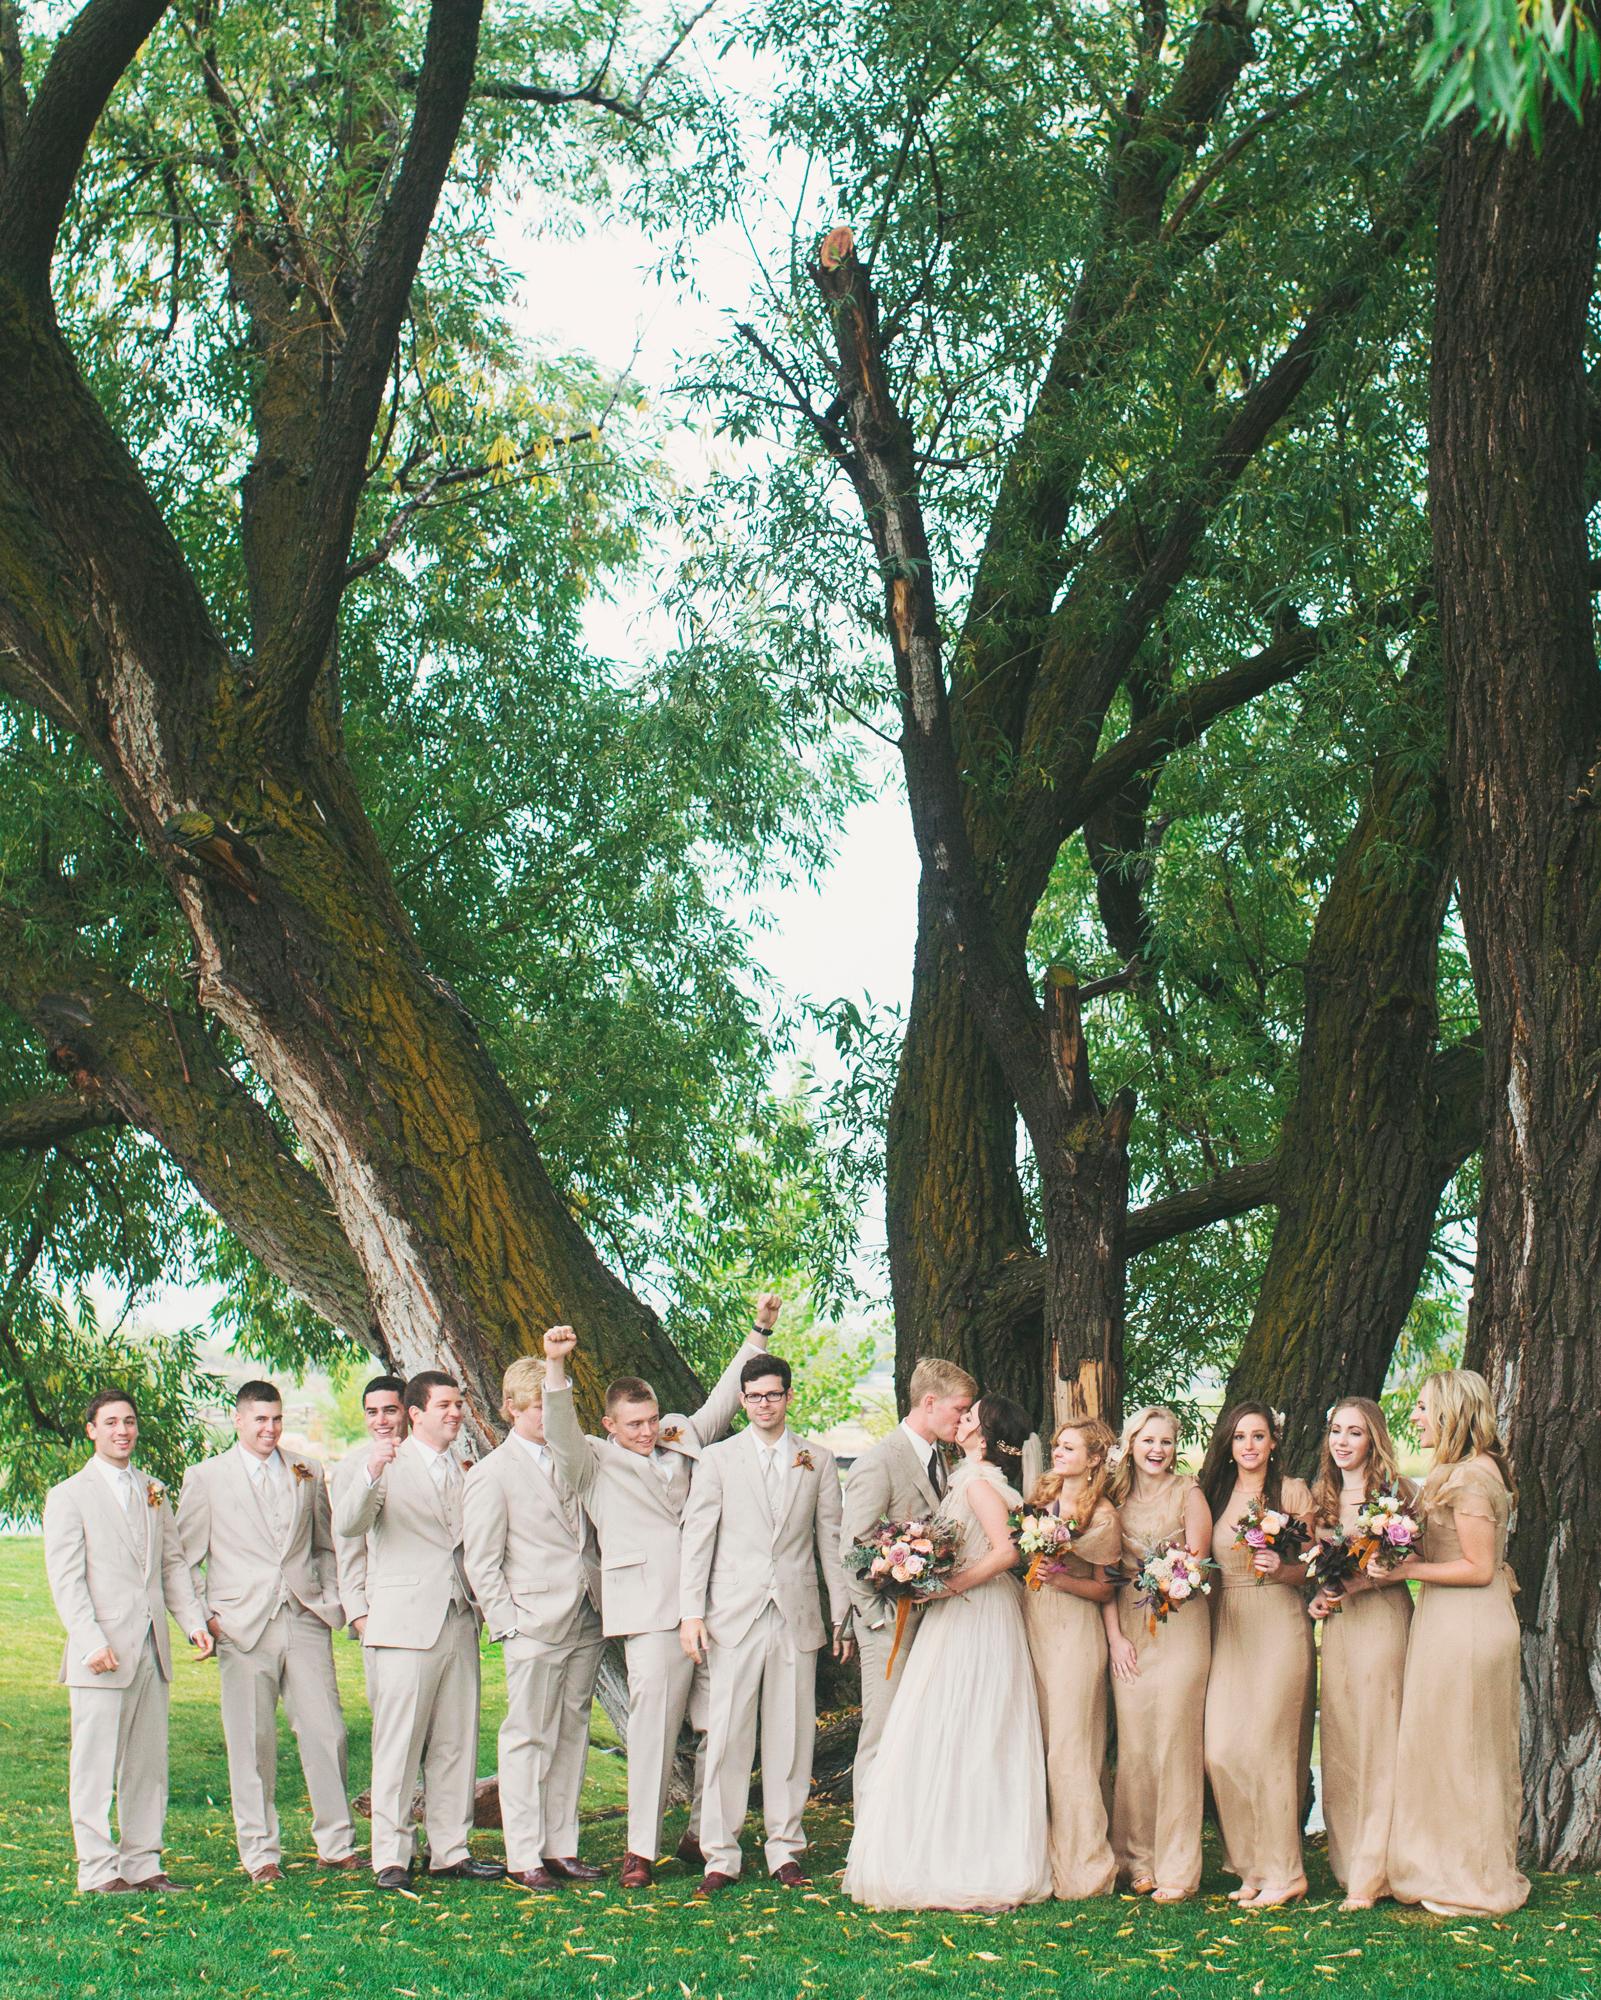 sara-matt-wedding-bridalparty-2341-s111990-0715.jpg